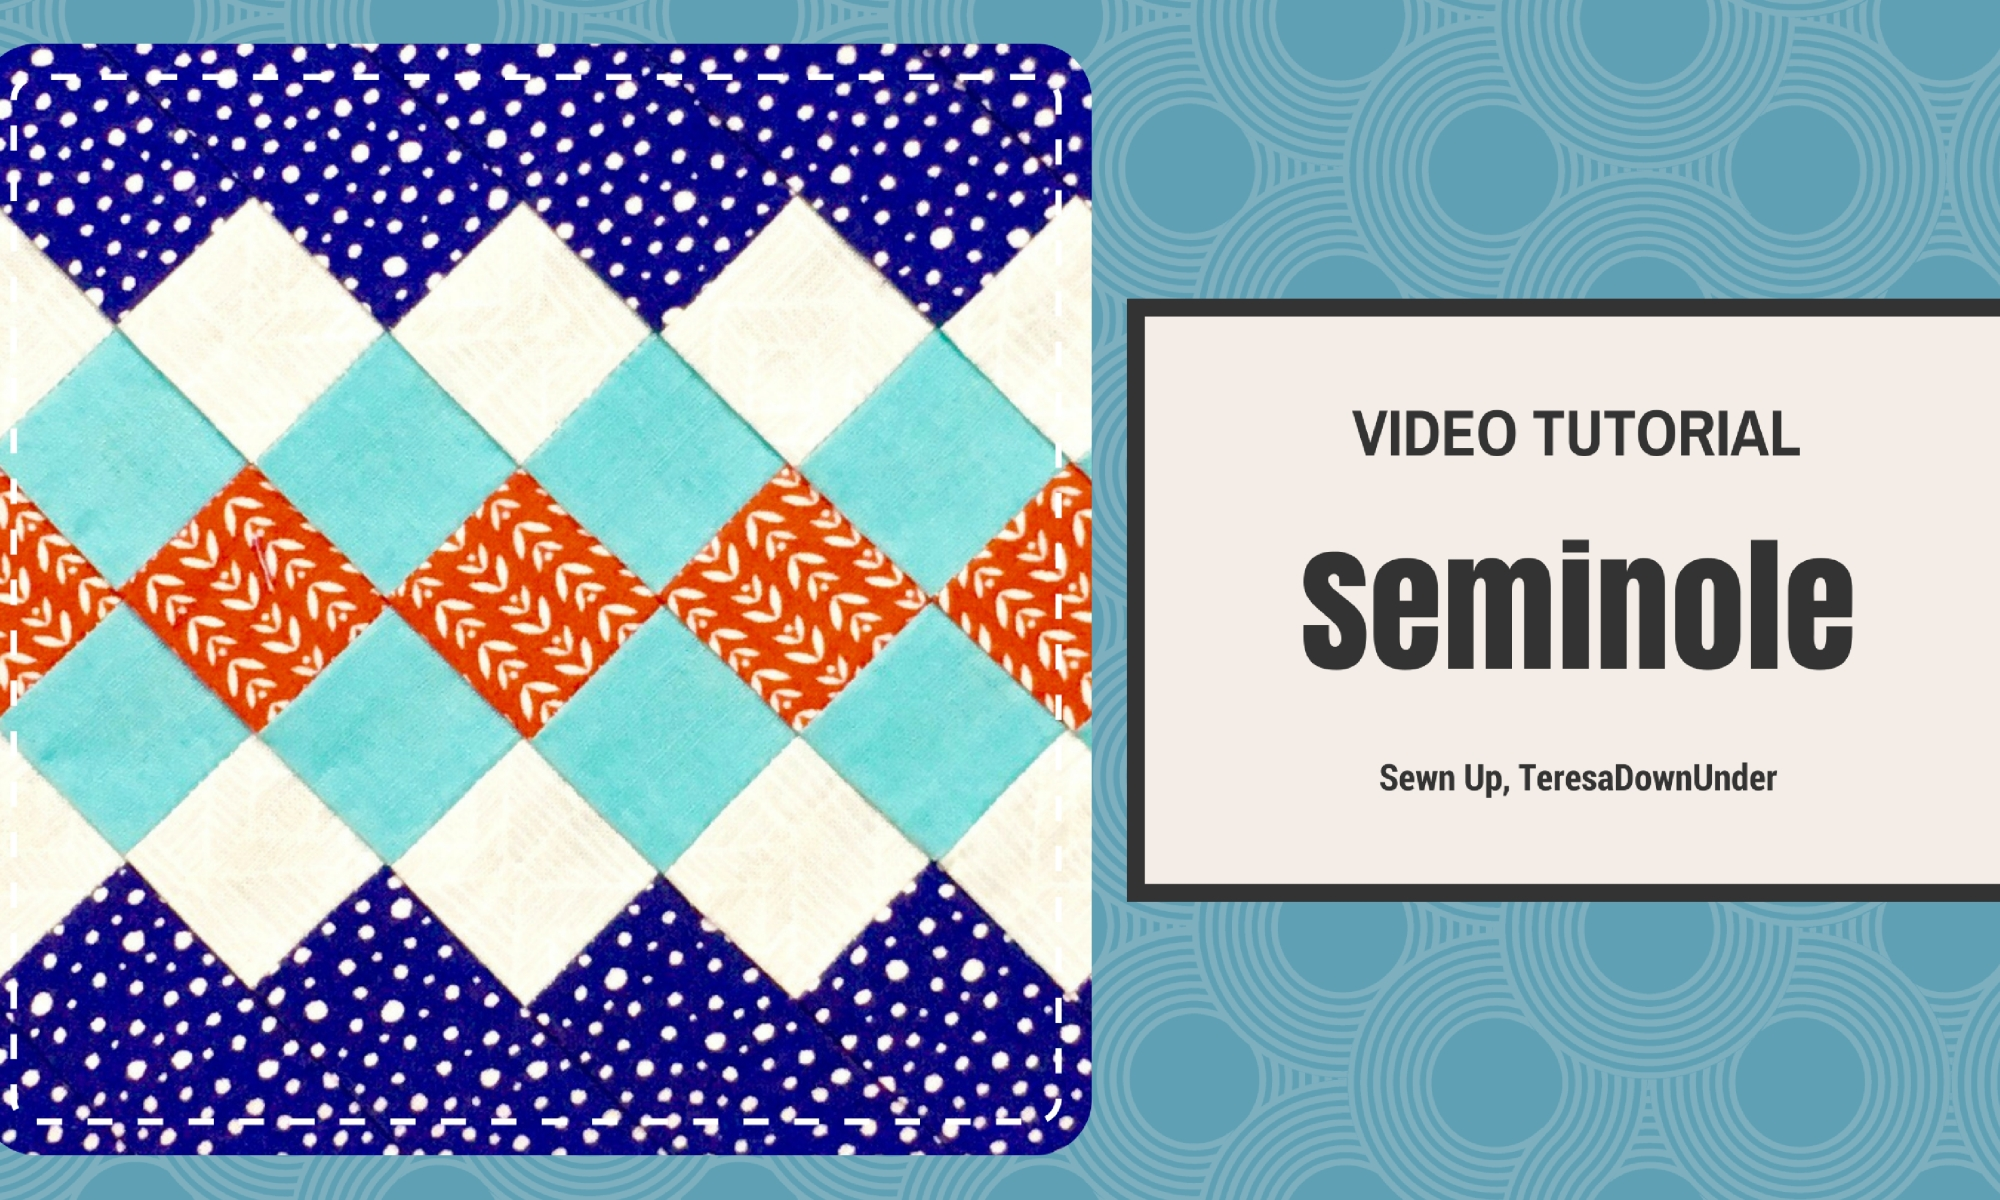 Video tutorial: Seminole